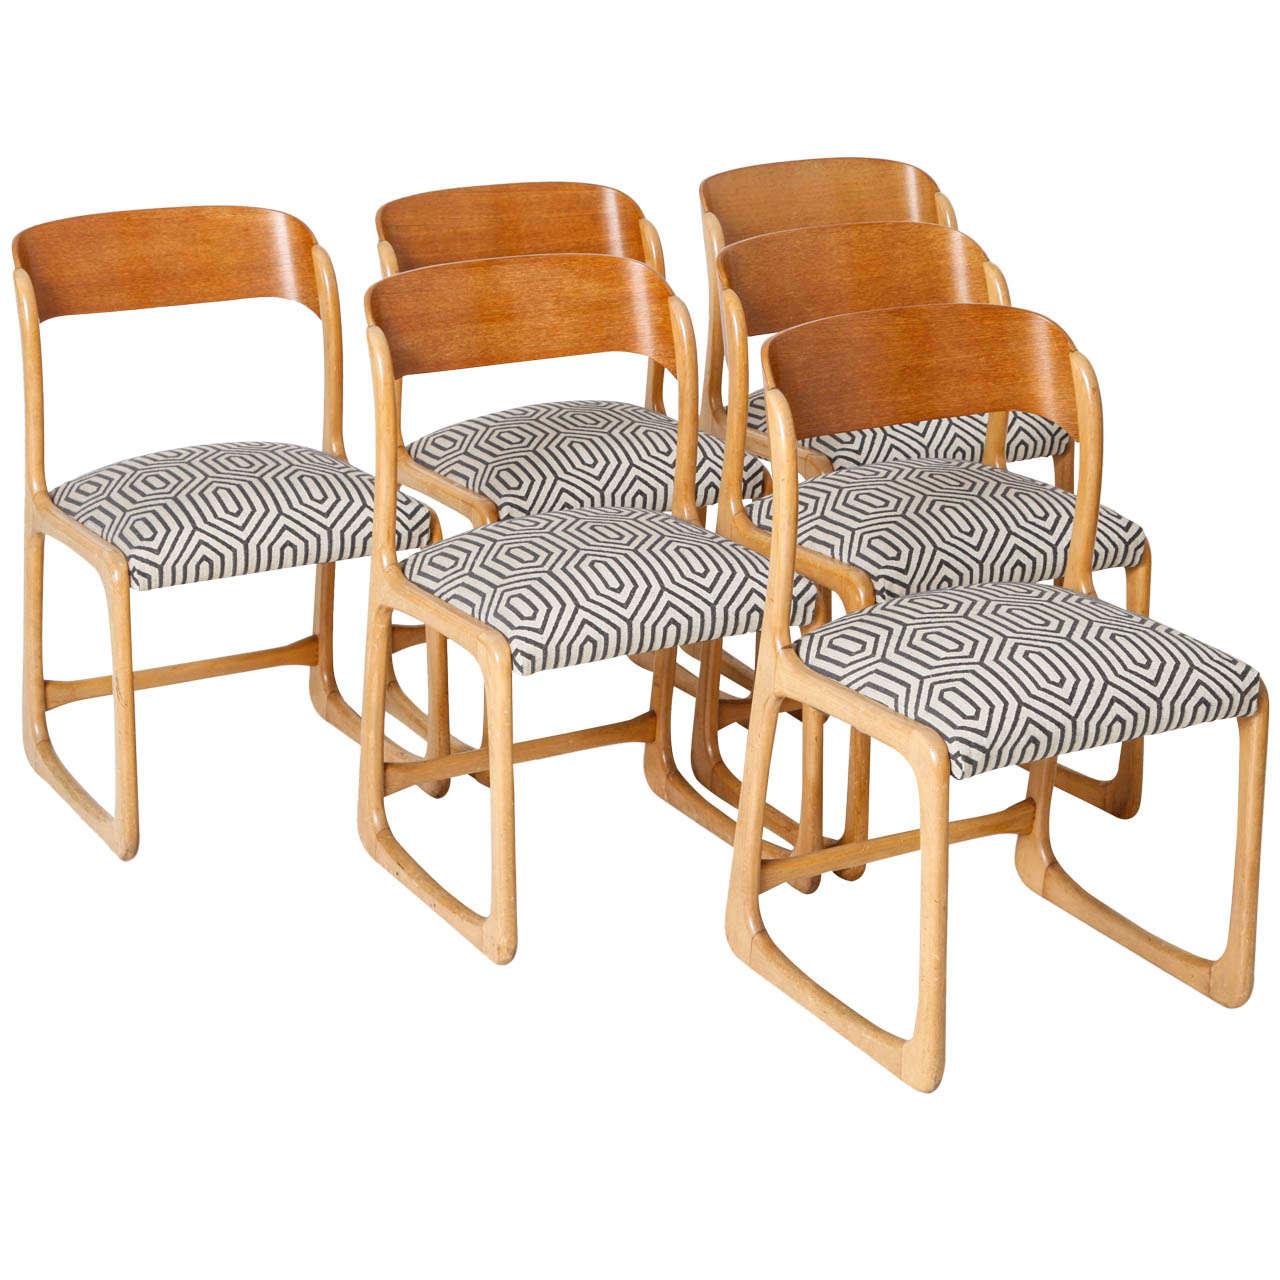 Stella Chairs